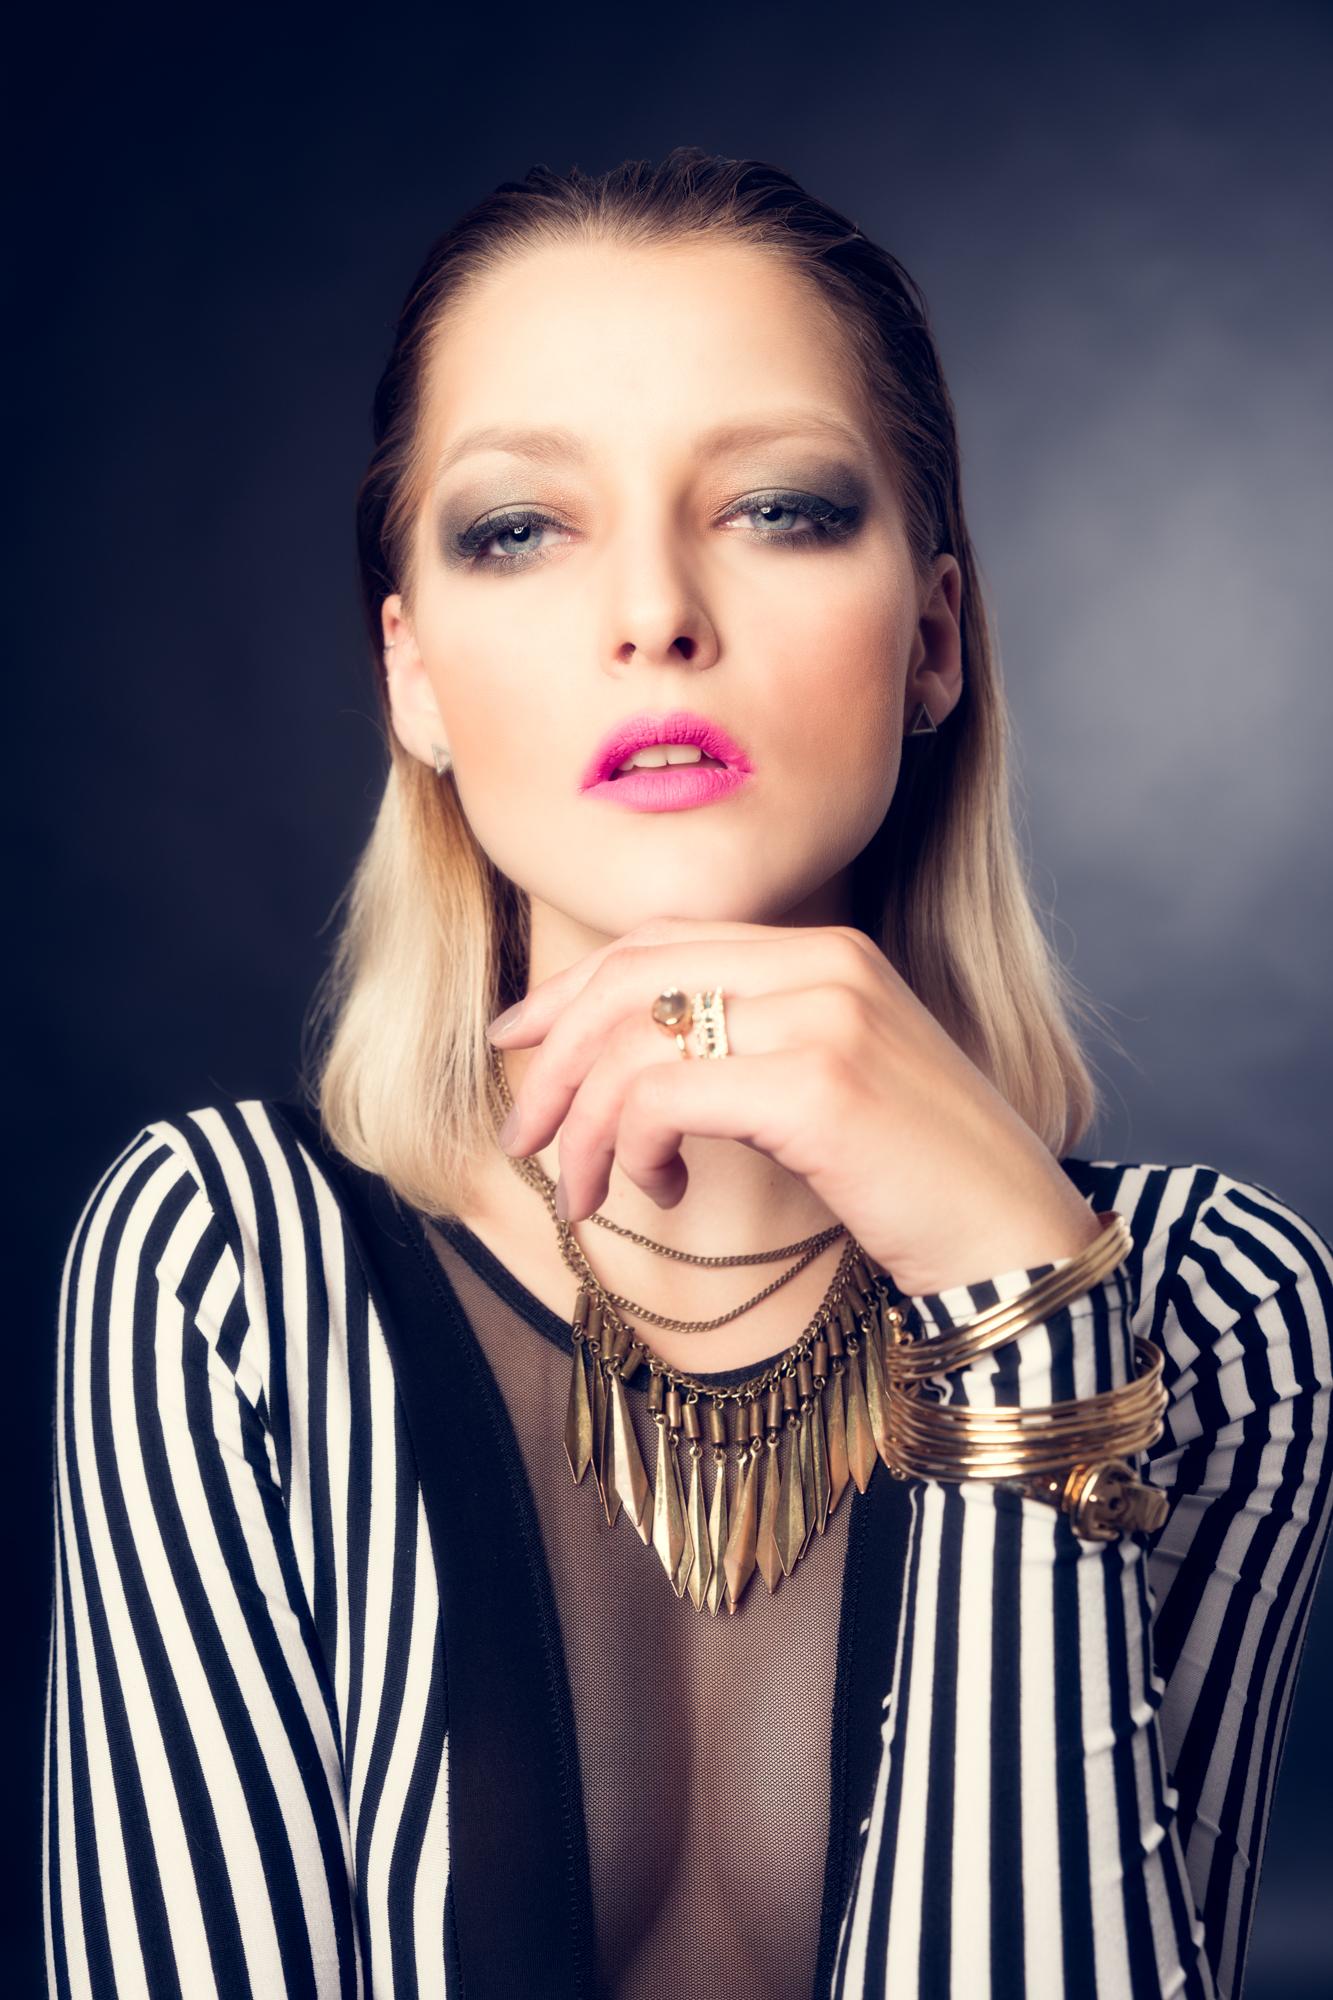 Fashion Portrait Fotoshooting Echo Of Light Photography